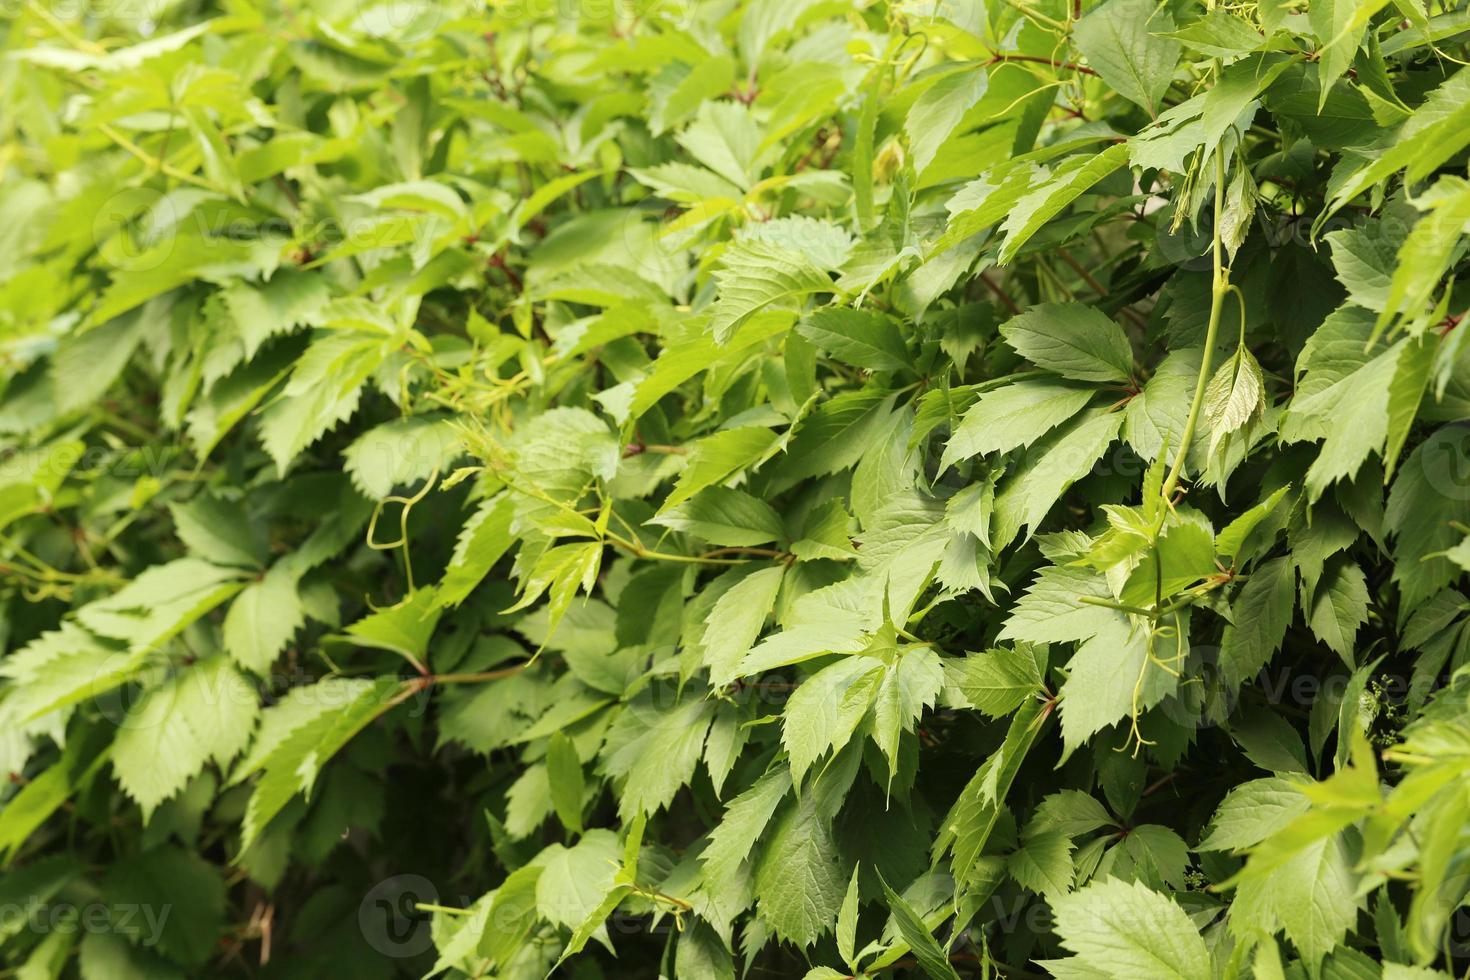 grönt druvblad utomhus foto